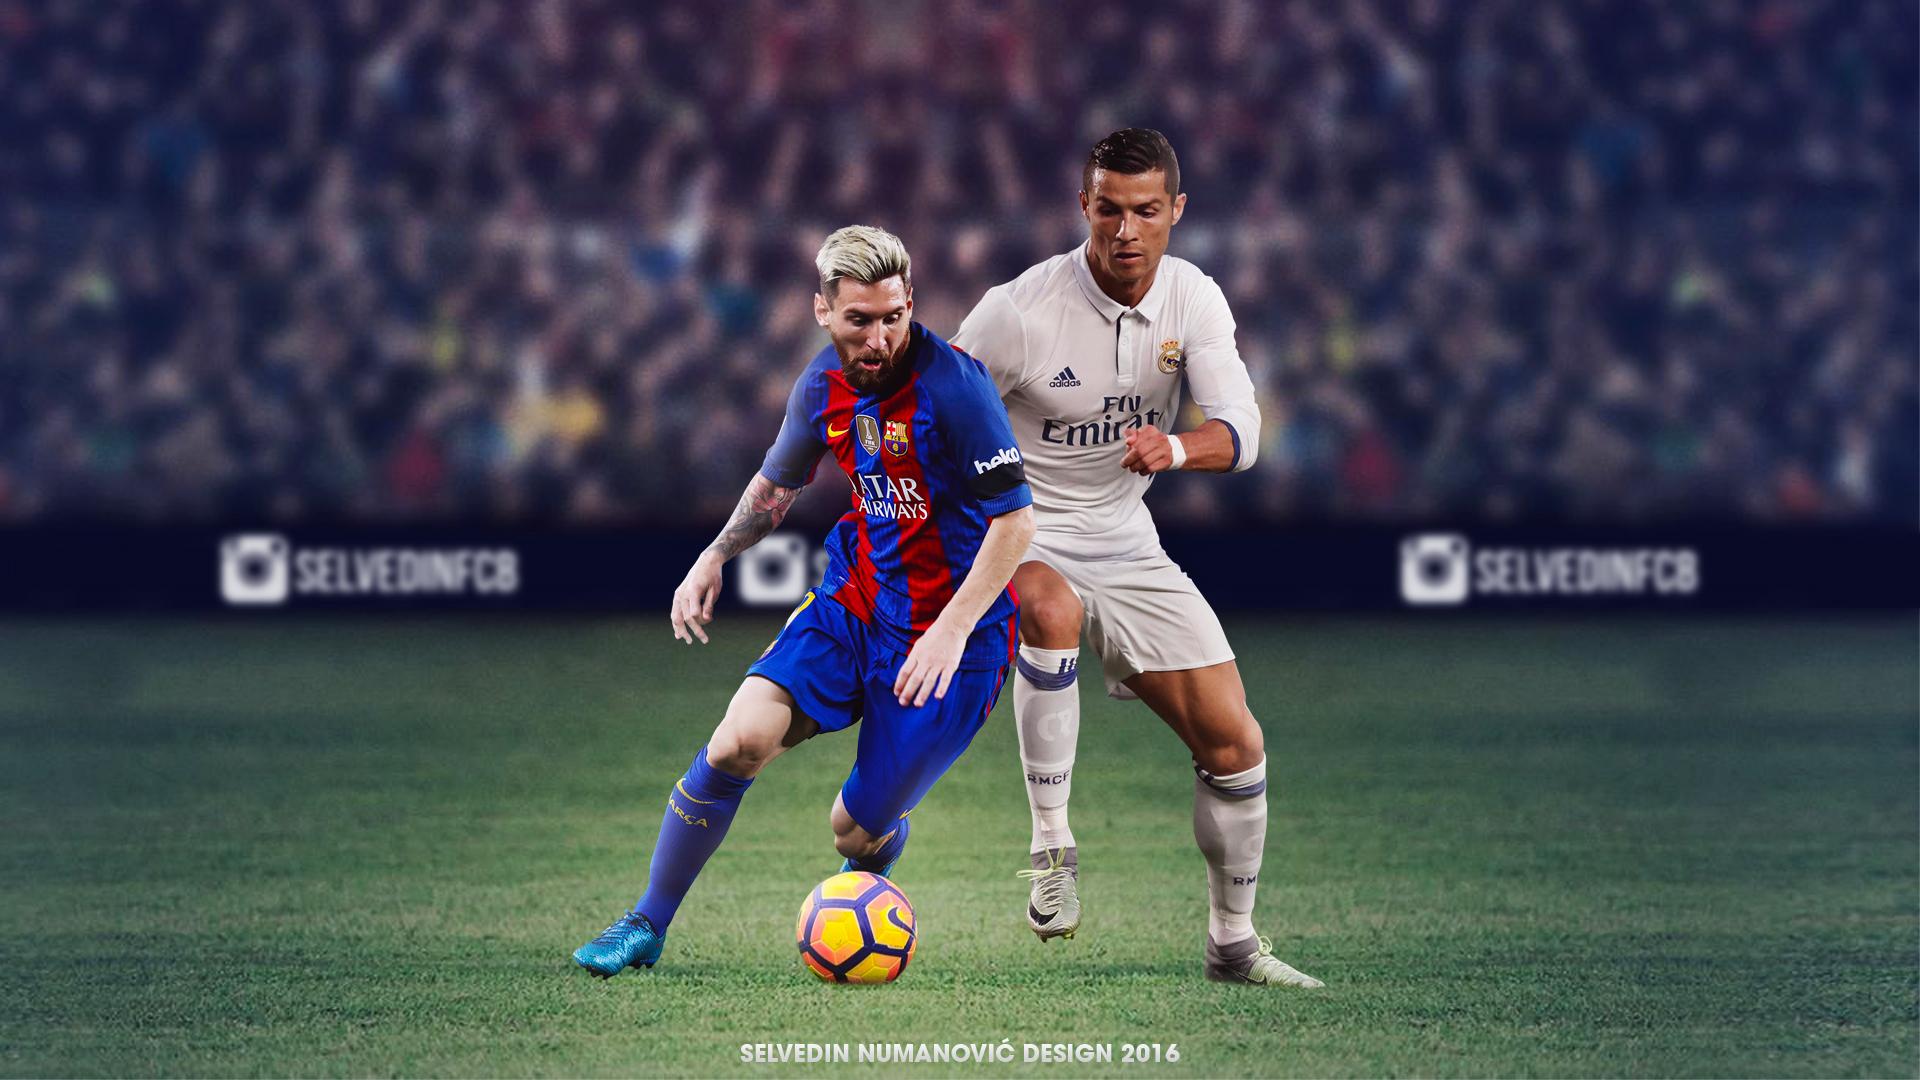 Ronaldo Vs Messi Wallpaper 2014 | www.imgkid.com - The ...